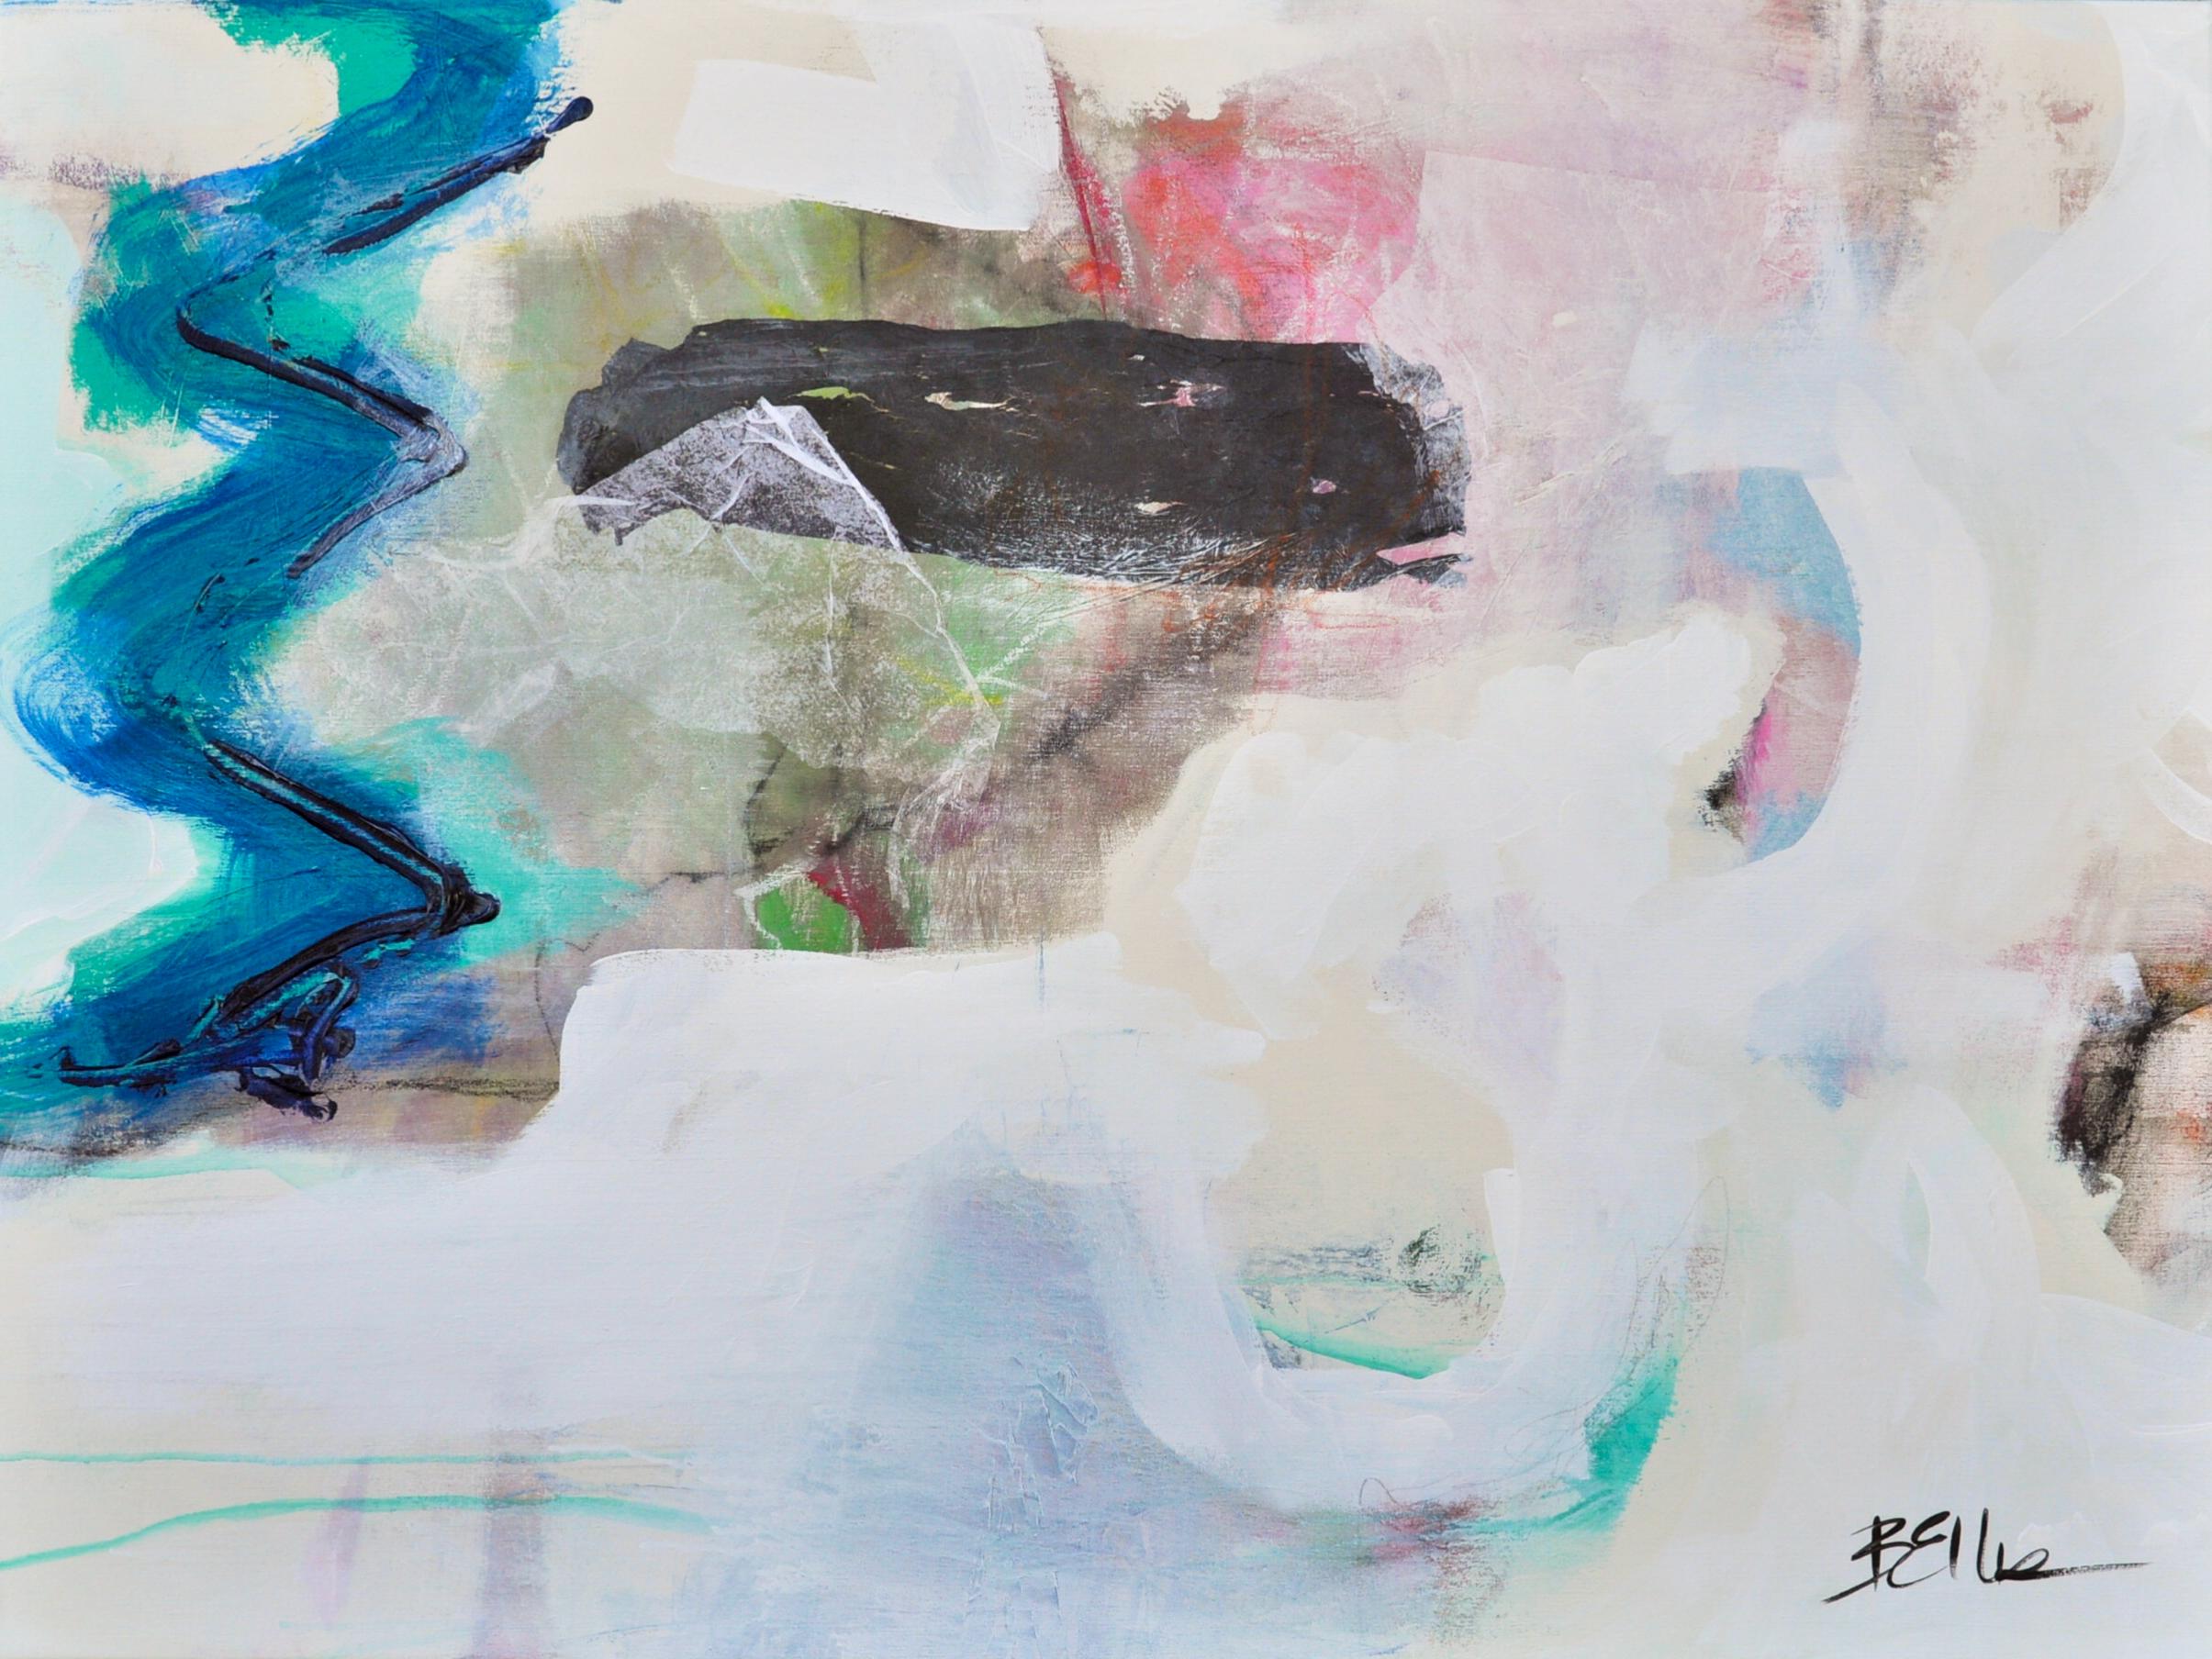 aqueous   Acrylic, art crayon and tissue on gallery wrap. 36 X 48 X 2